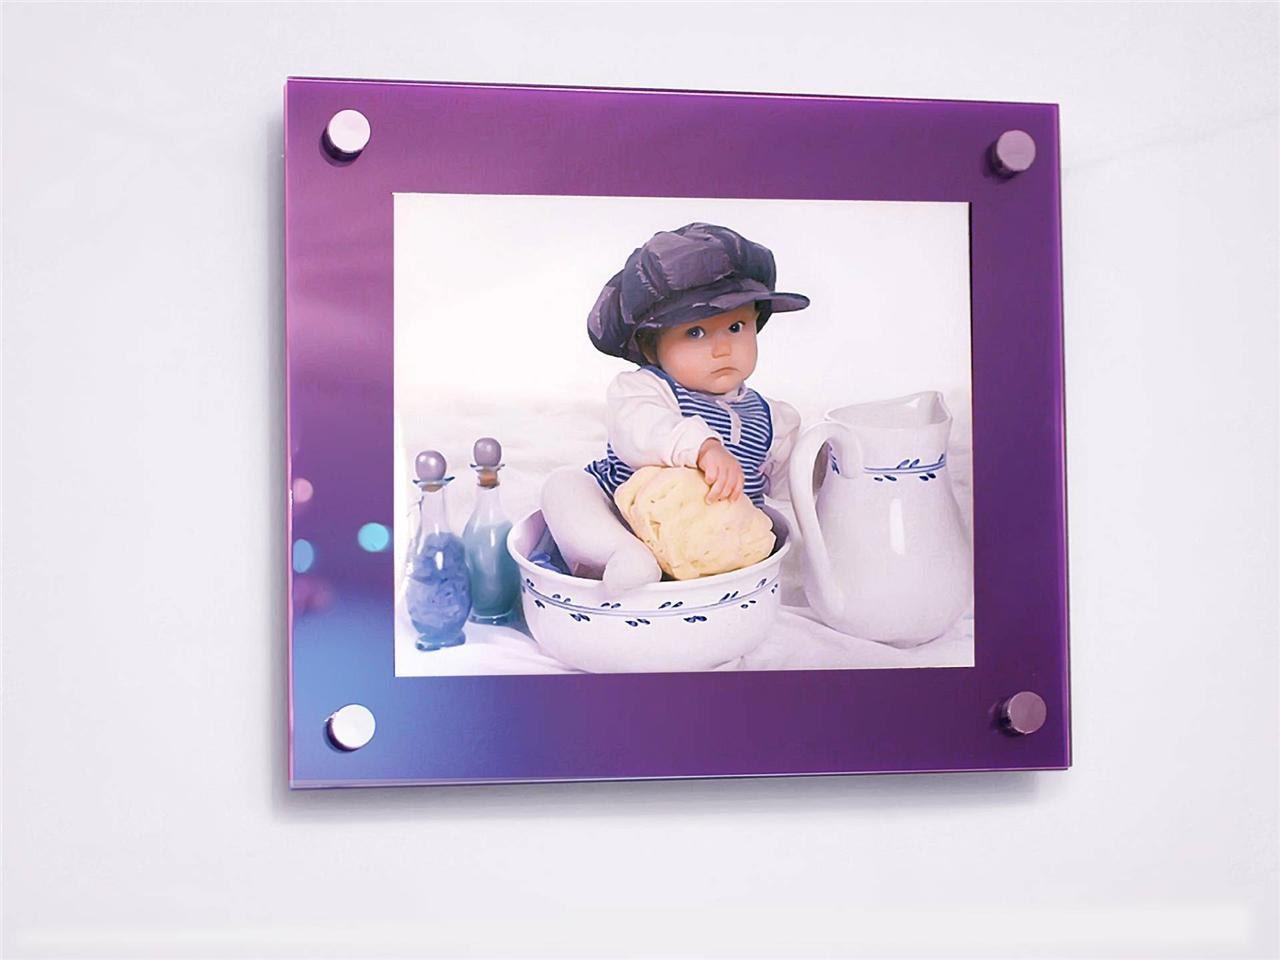 purple floating high gloss cheshire acrylic 16 x 20 40 x 50 cm 20